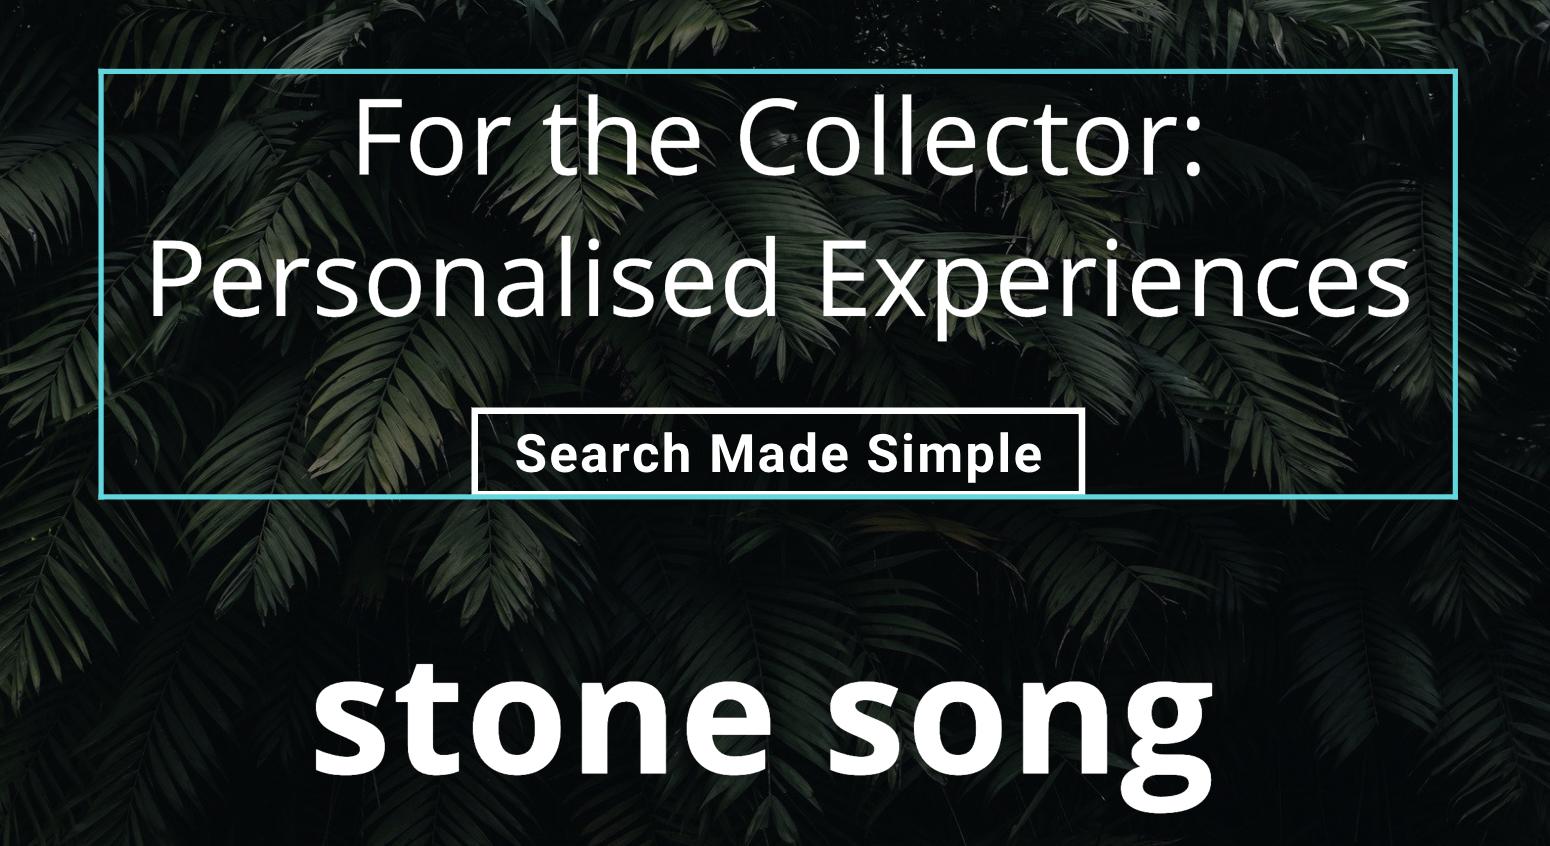 Stone Song showcase